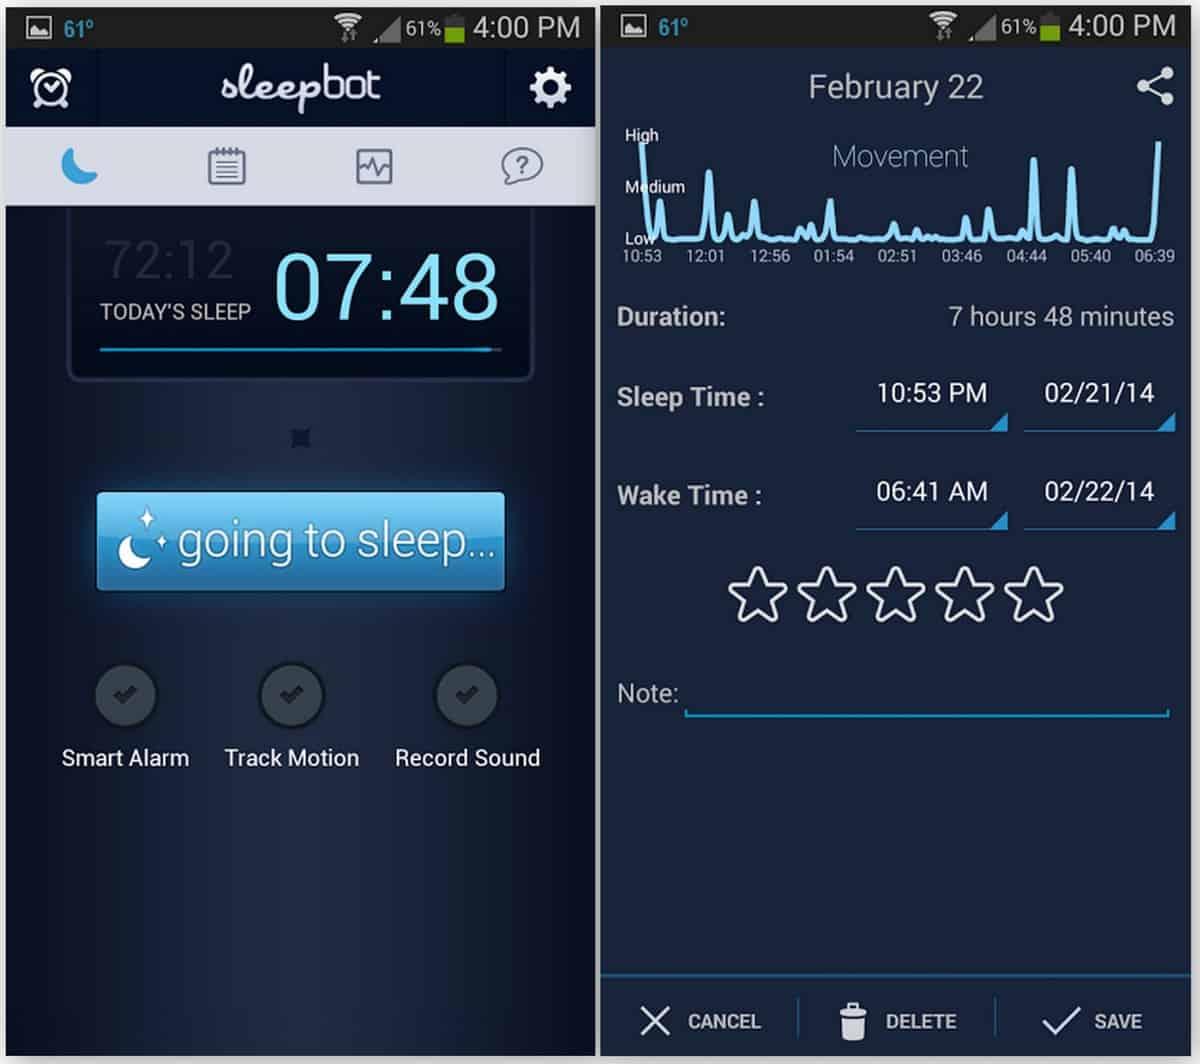 A photo of Sleepbot, one of many useful apps.